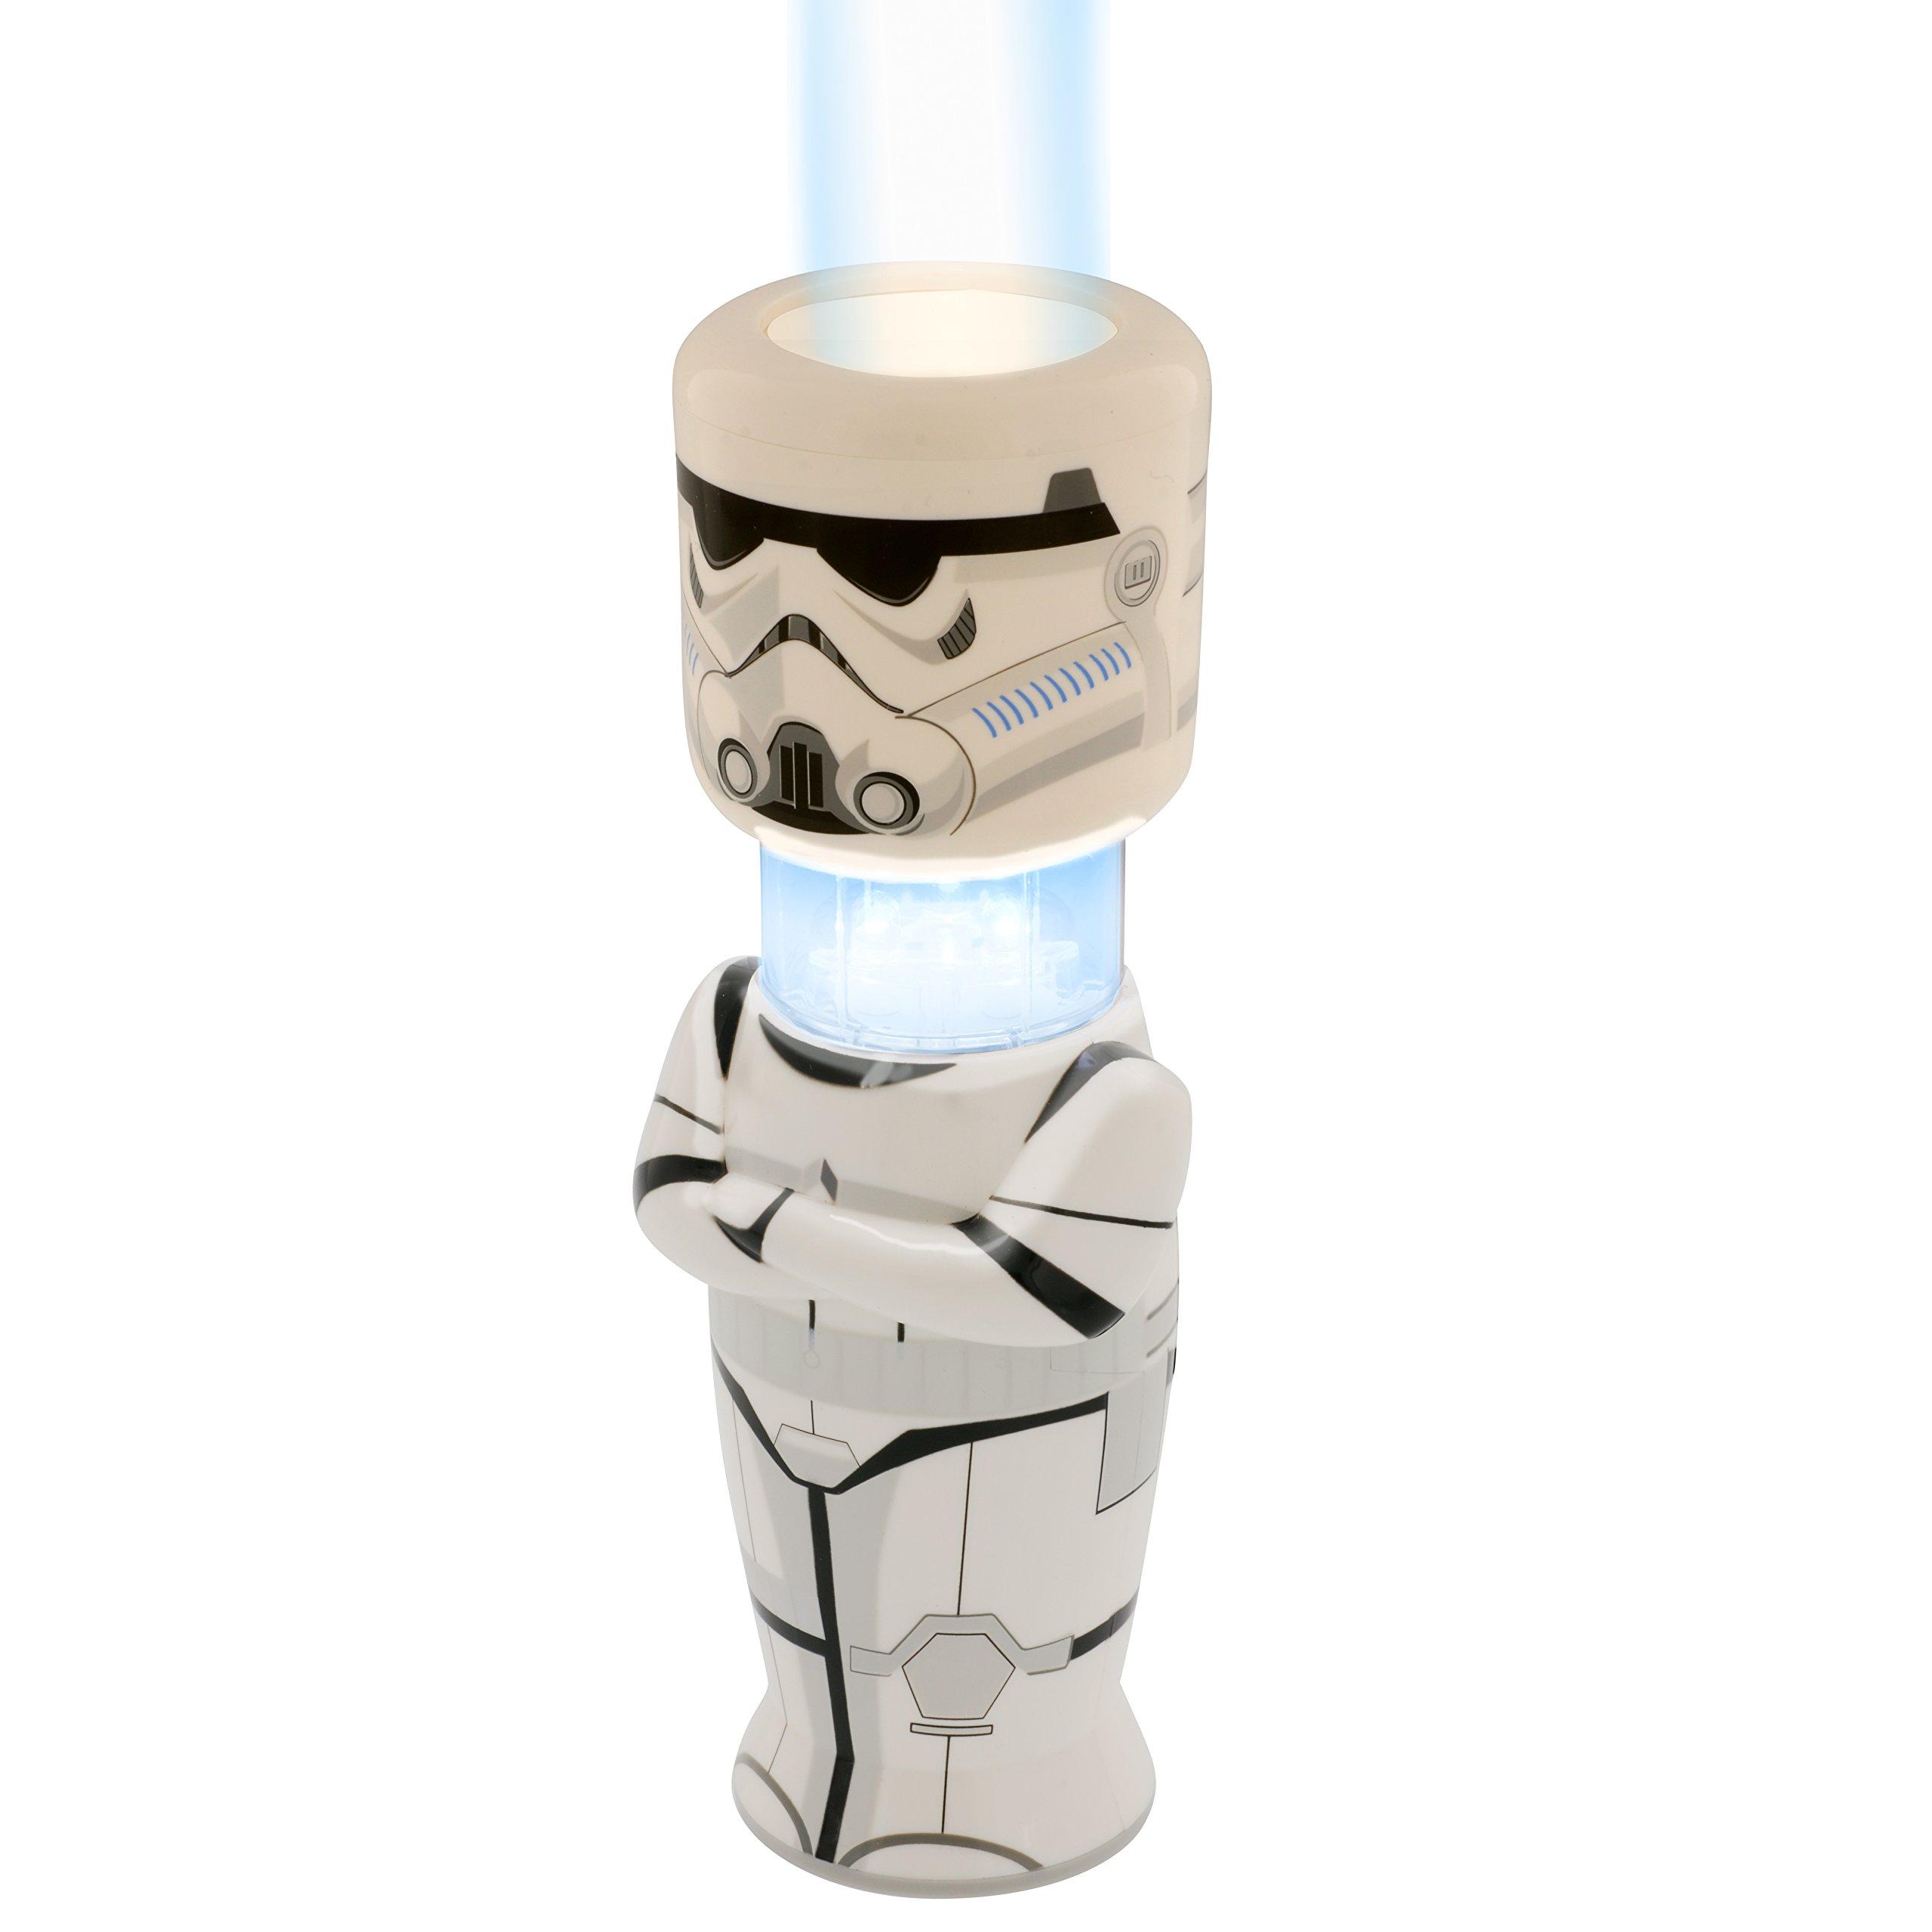 Star Wars Rebels Stormtrooper Hand Held Lamp Flashlight - Bright LED Light Multi-function Lantern w/ Timer